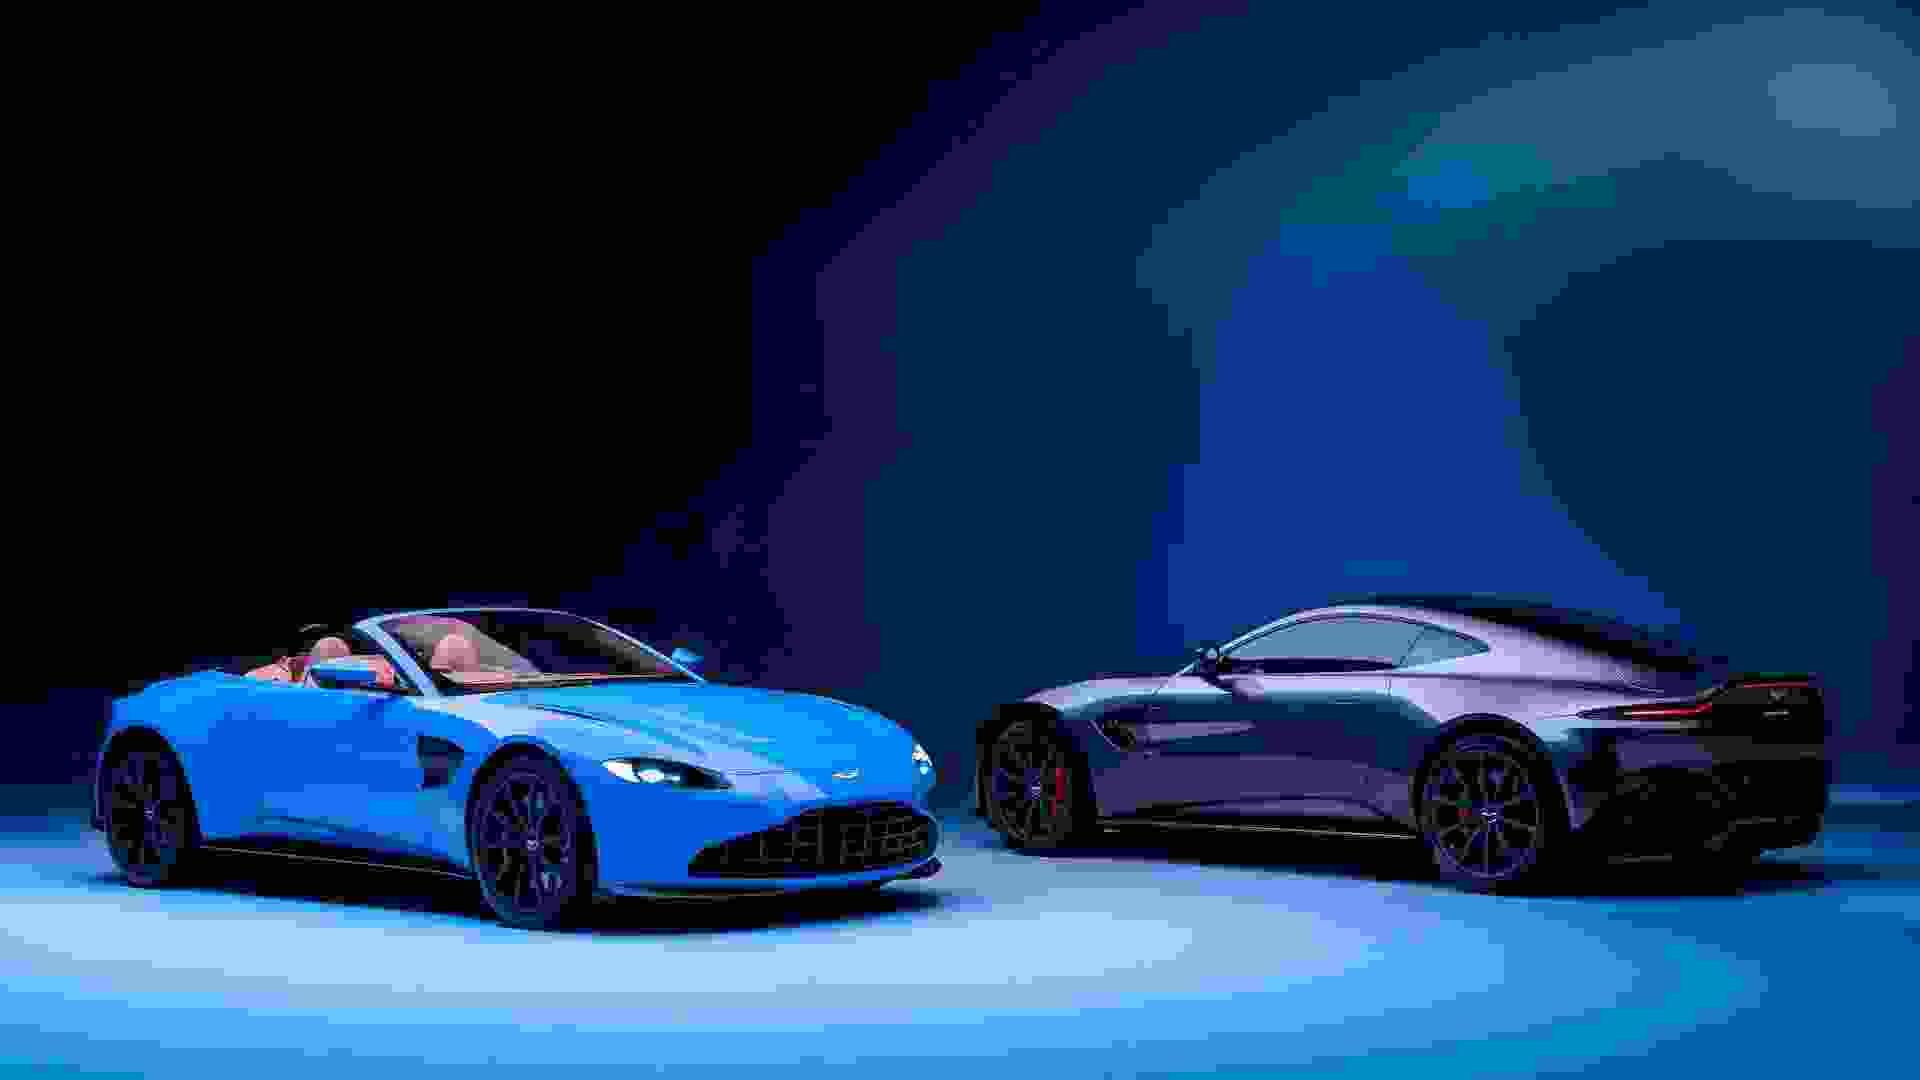 2021-aston-martin-vantage-roadster-6